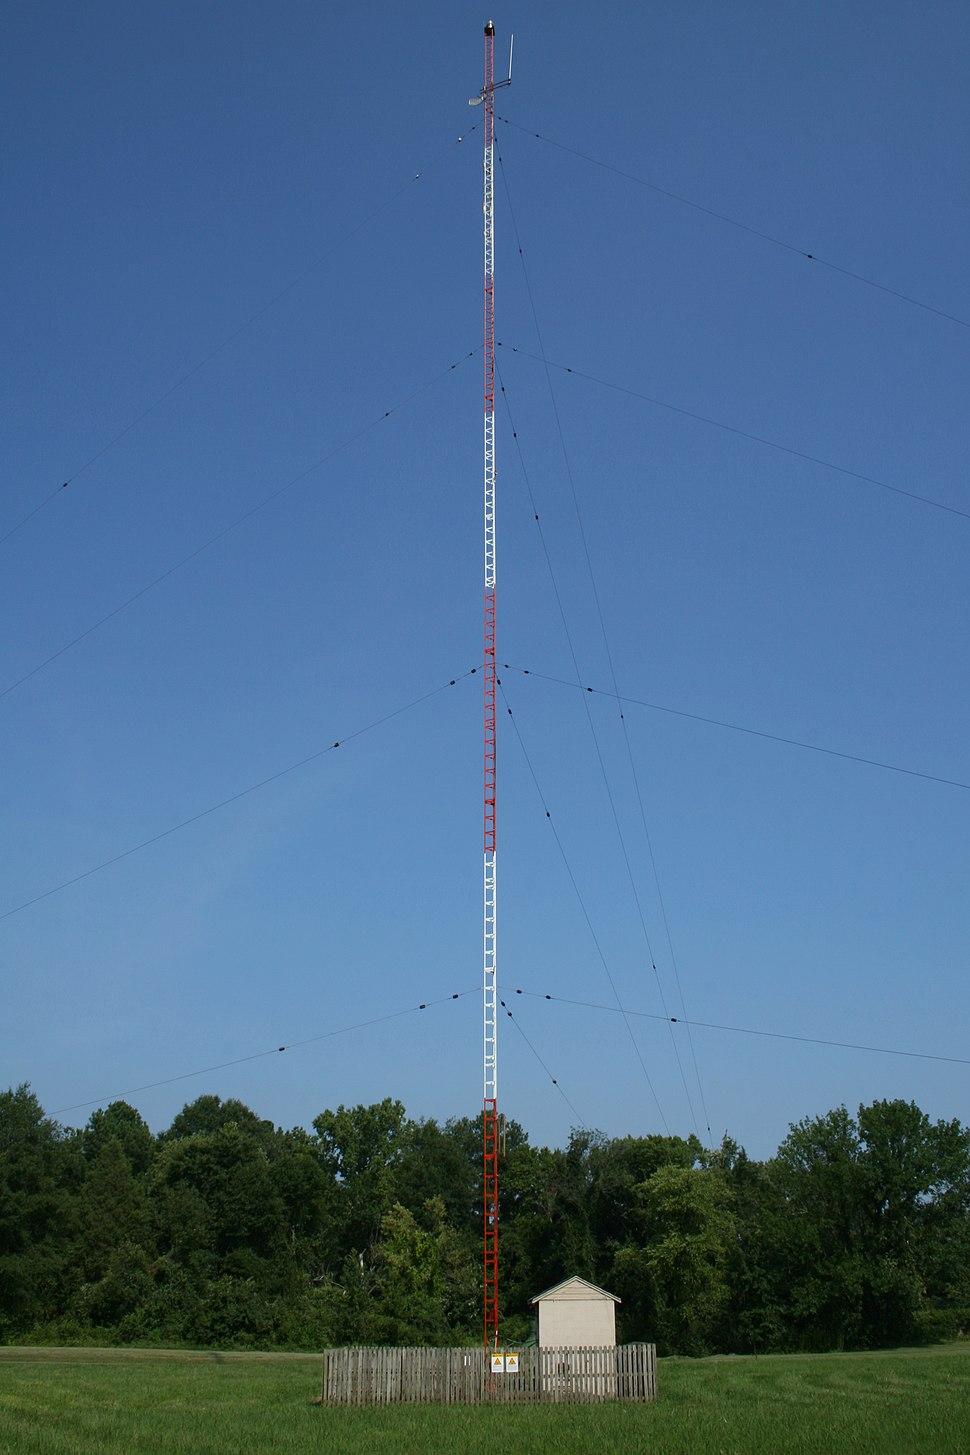 2008-07-28 Mast radiator